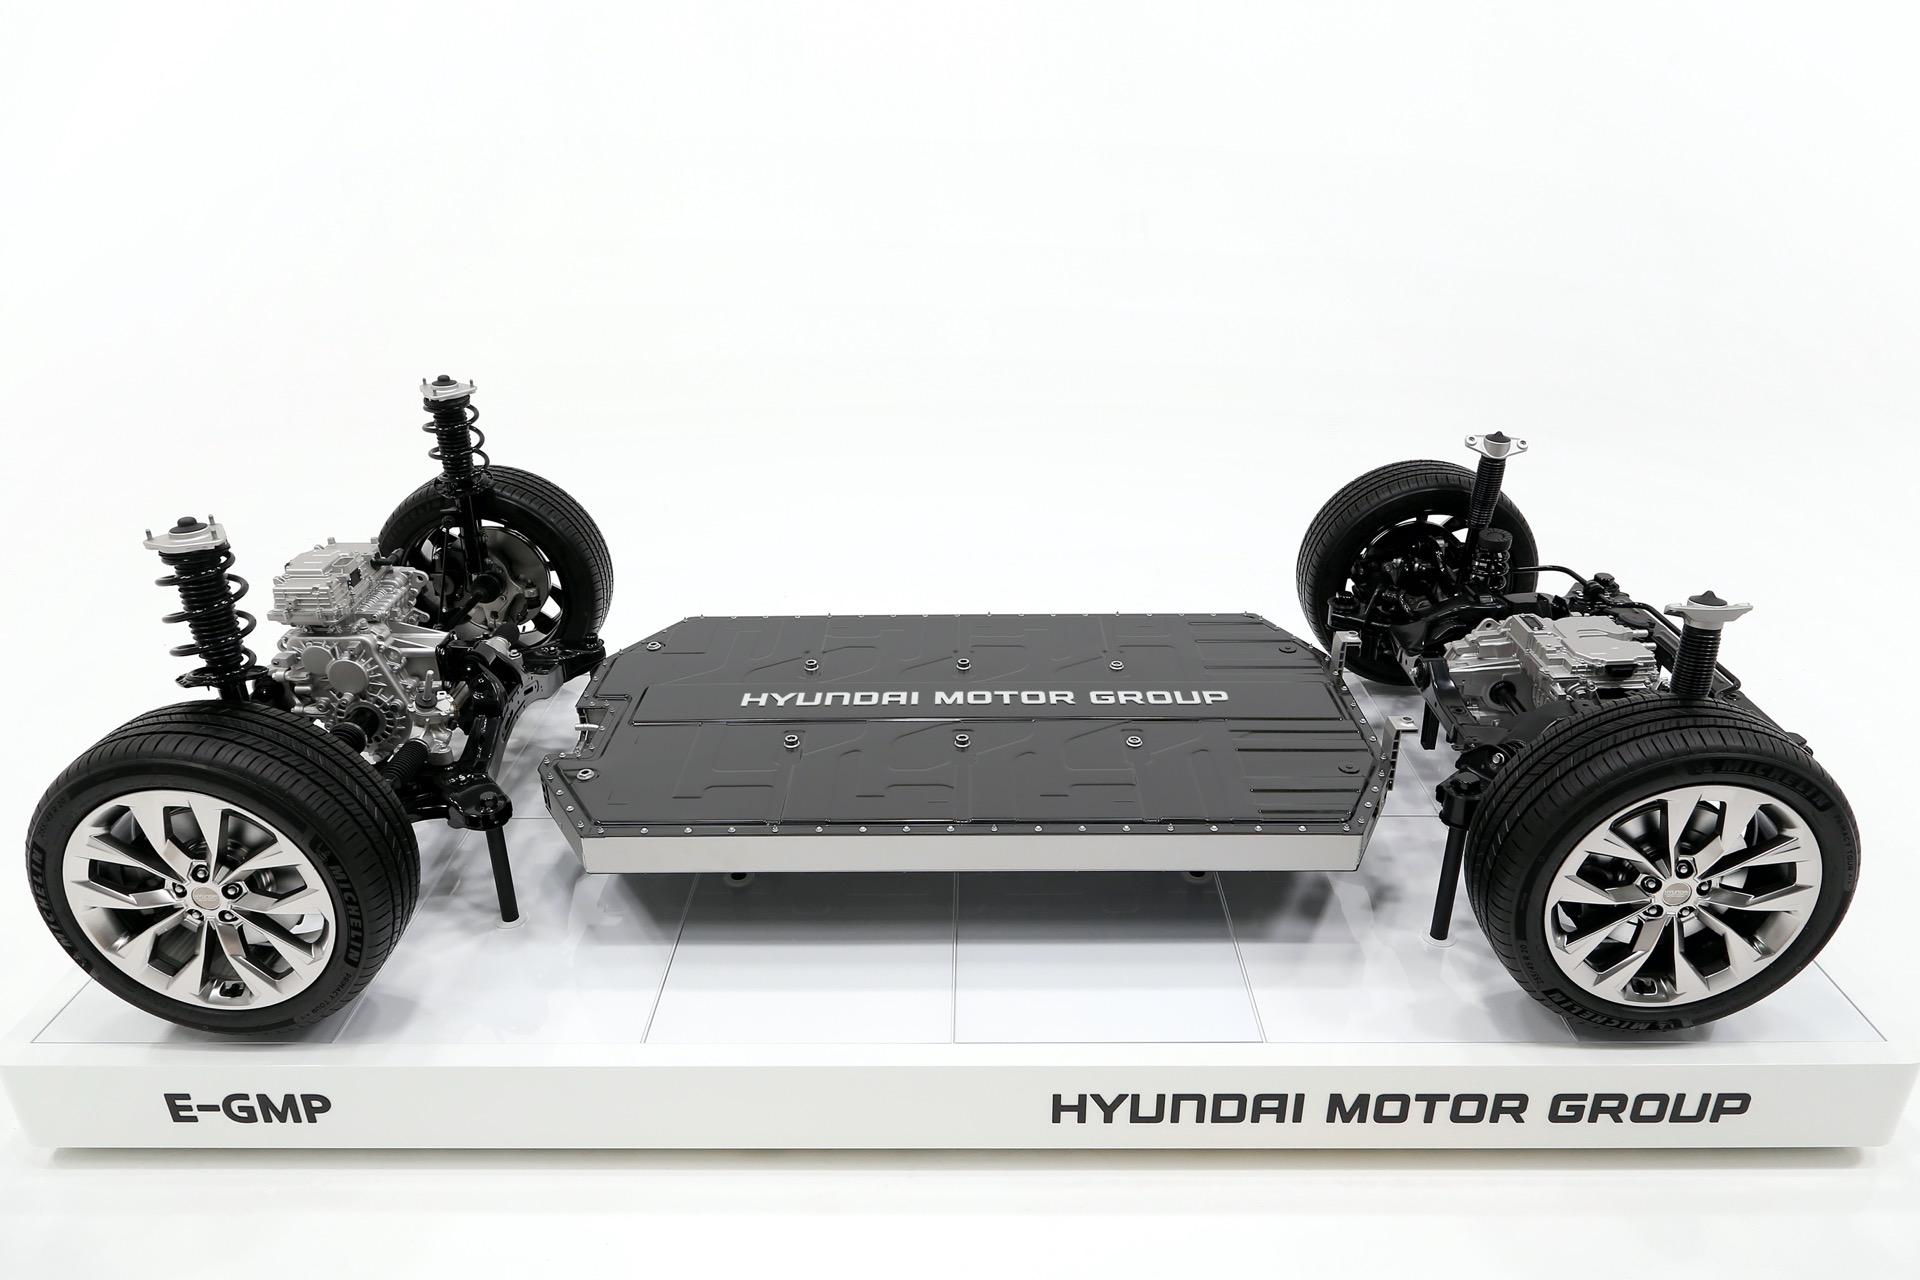 greencarreports.com - Bengt Halvorson - Electric car platform for Hyundai, Kia, Genesis: Bi-directional charging, robotaxi ready